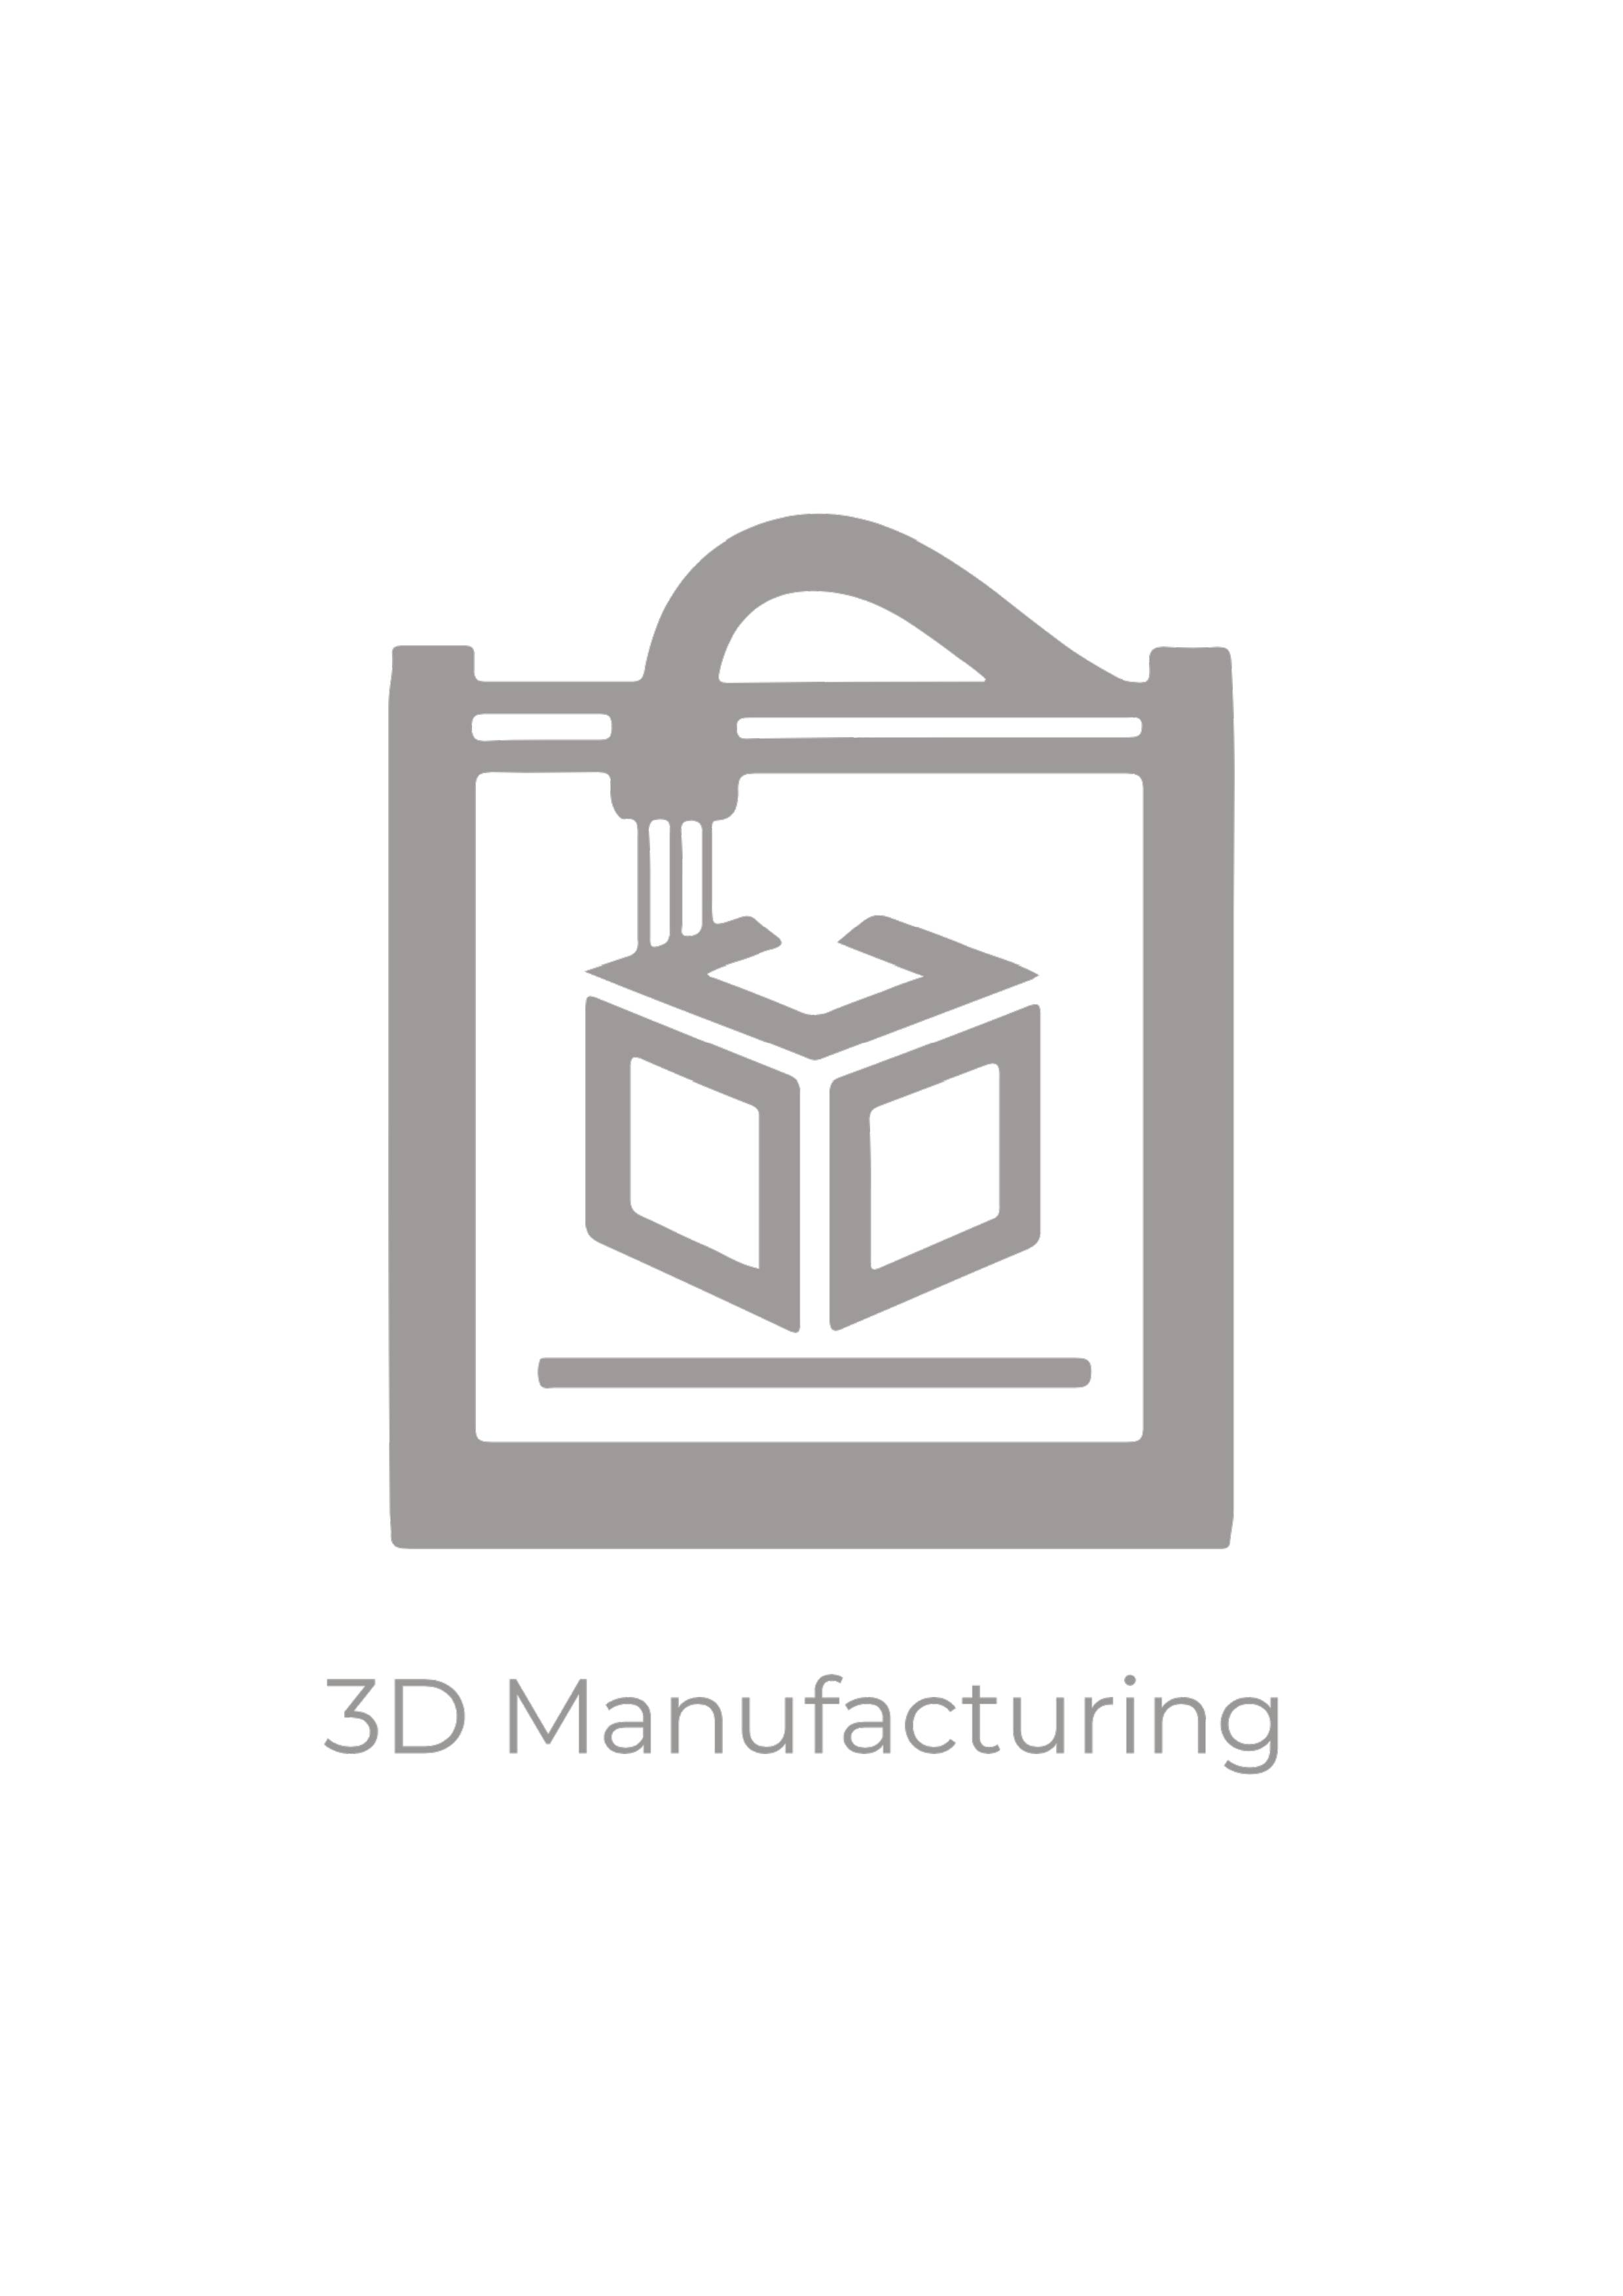 3DManufacturing.jpg